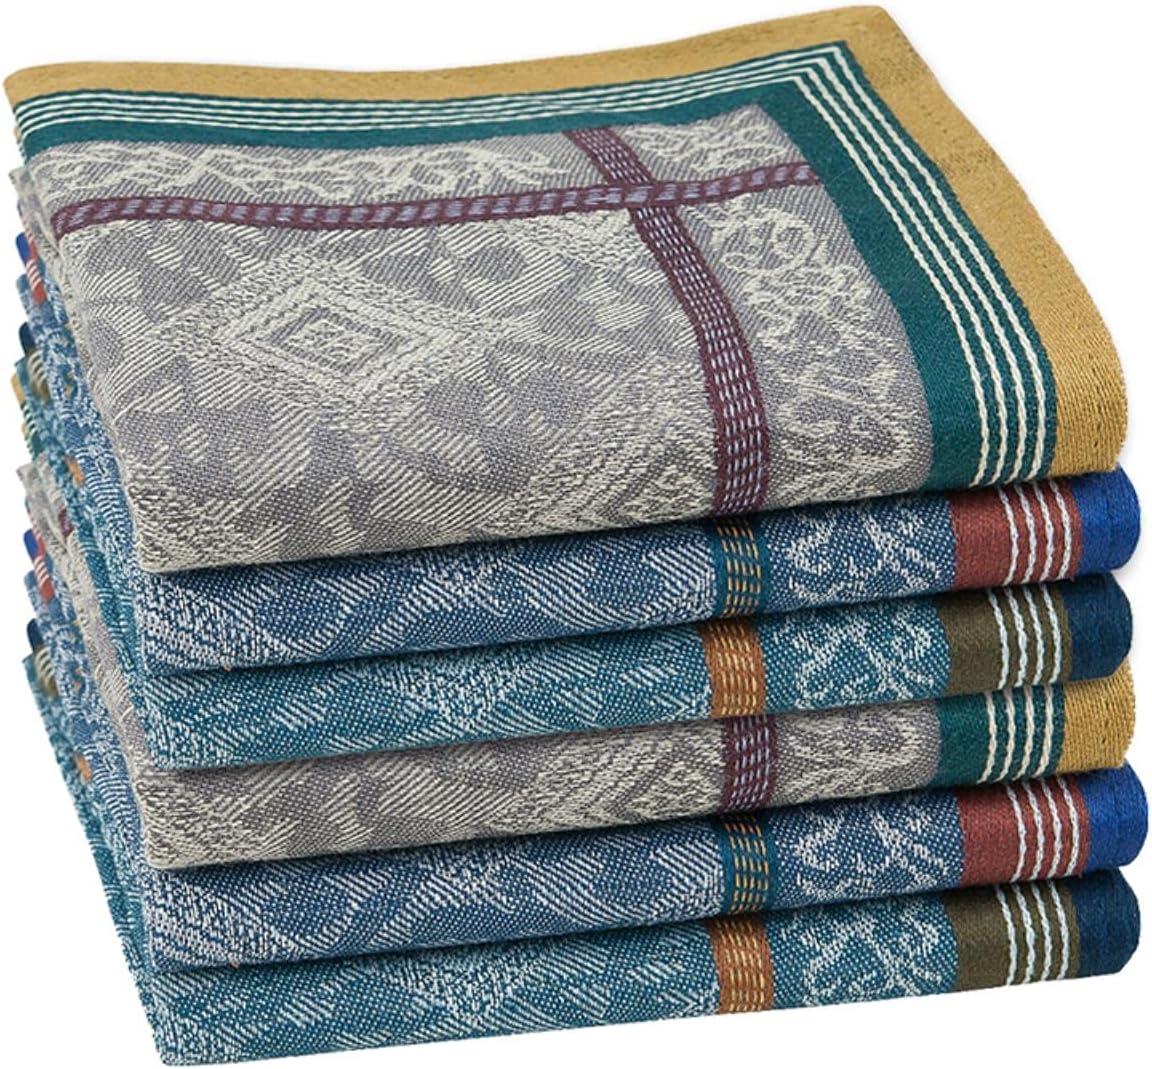 HJJACS 6PCs Fashion Square Cotton Jacquard Handkerchief for Men The Gentlmen Classic Style Fashion Vintage Handkerchief